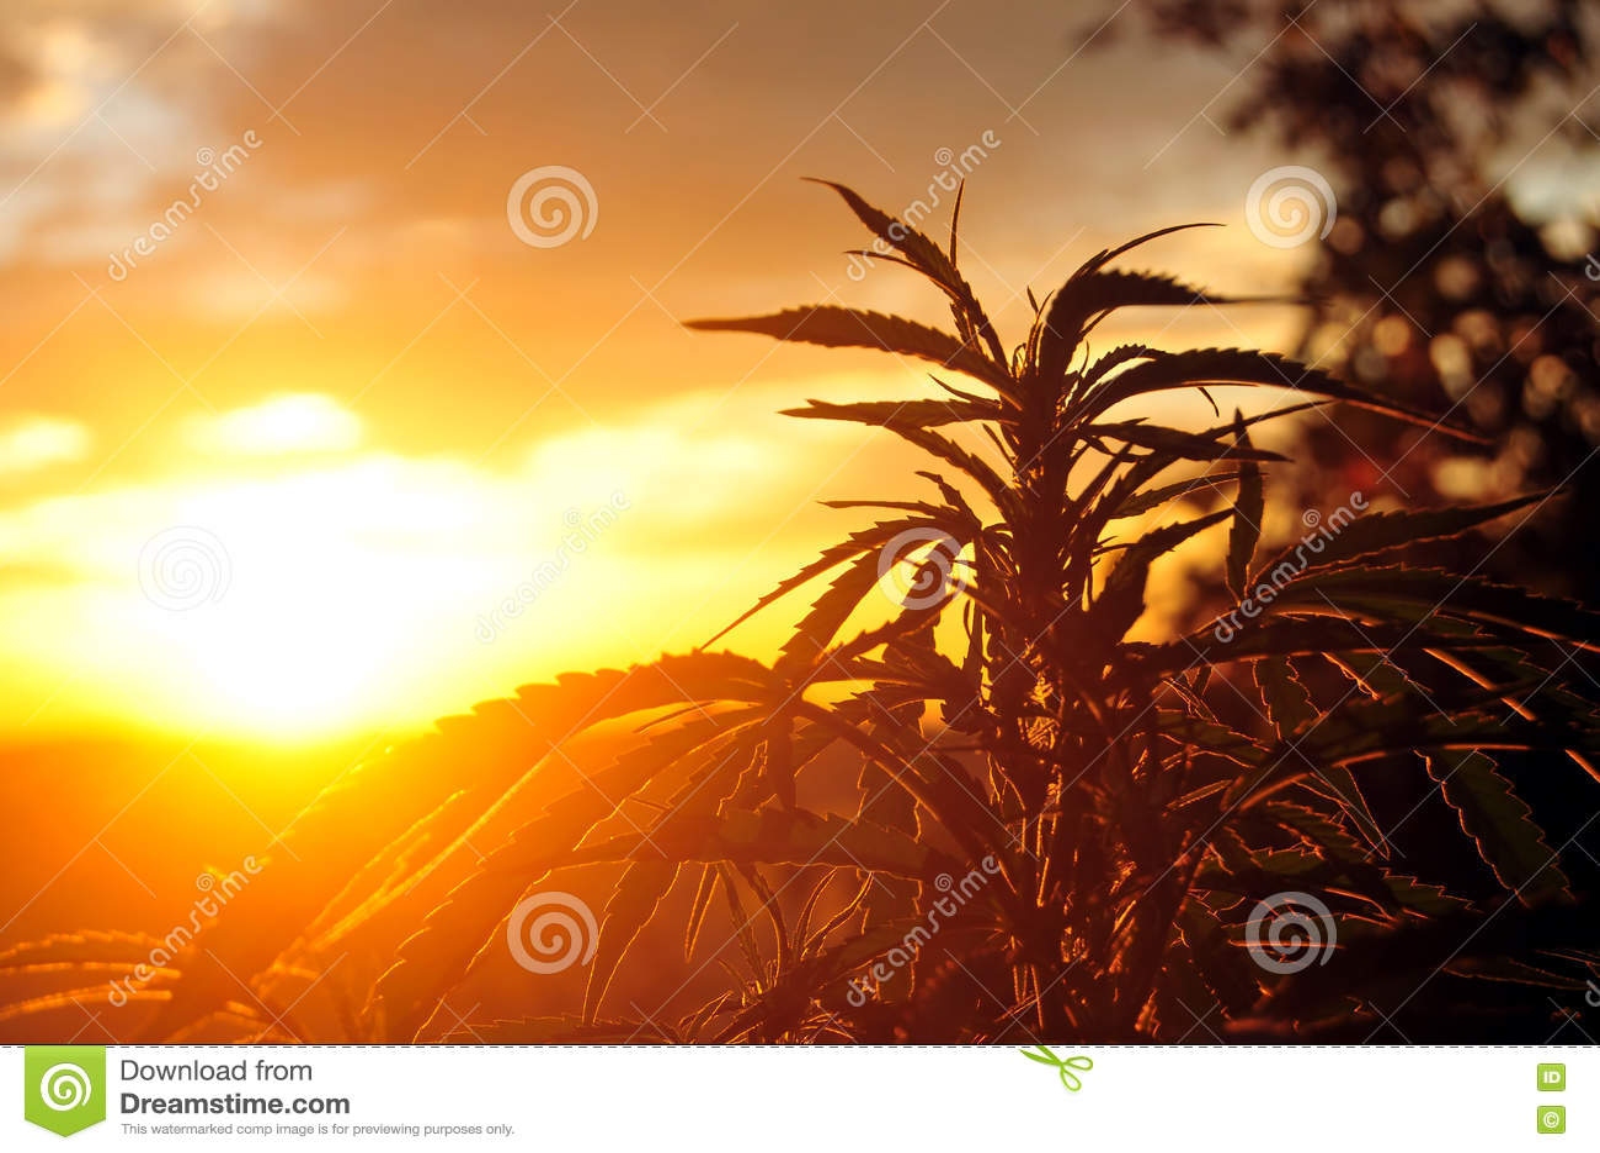 Конопли засаживают на восходе солнца